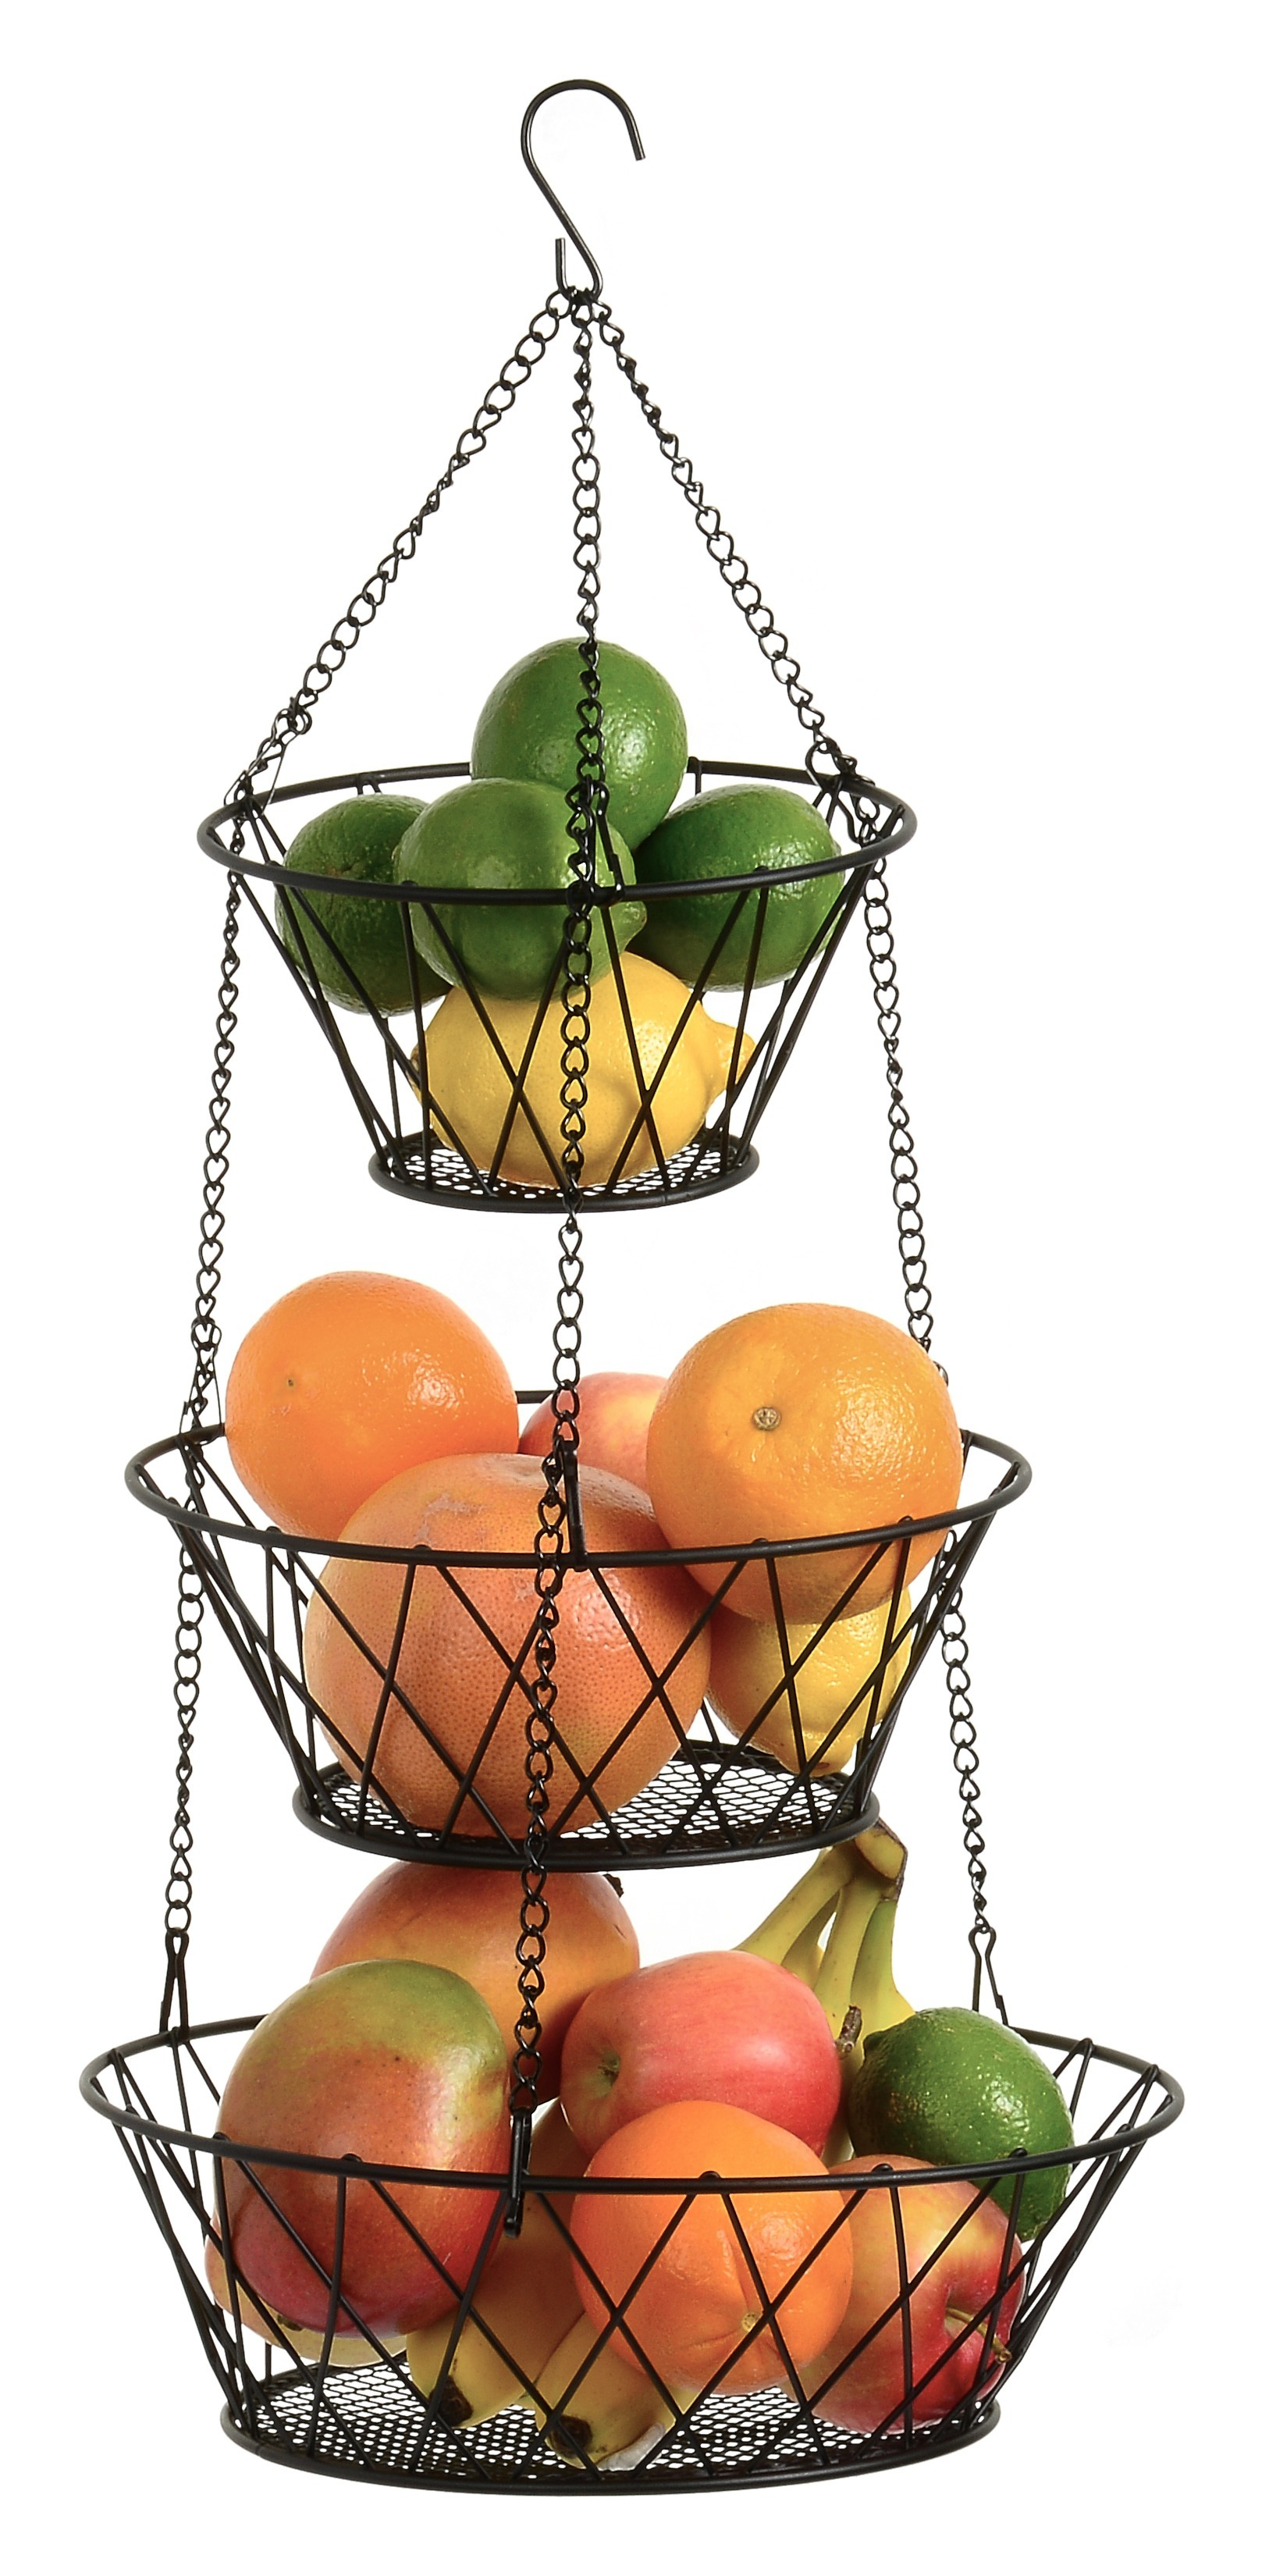 Heavy Duty 3 Tier Hanging Kitchen Black Fruit Basket